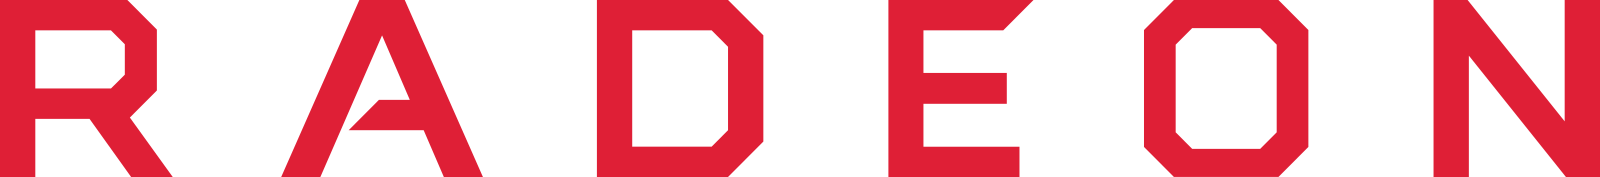 radeon-logo-4